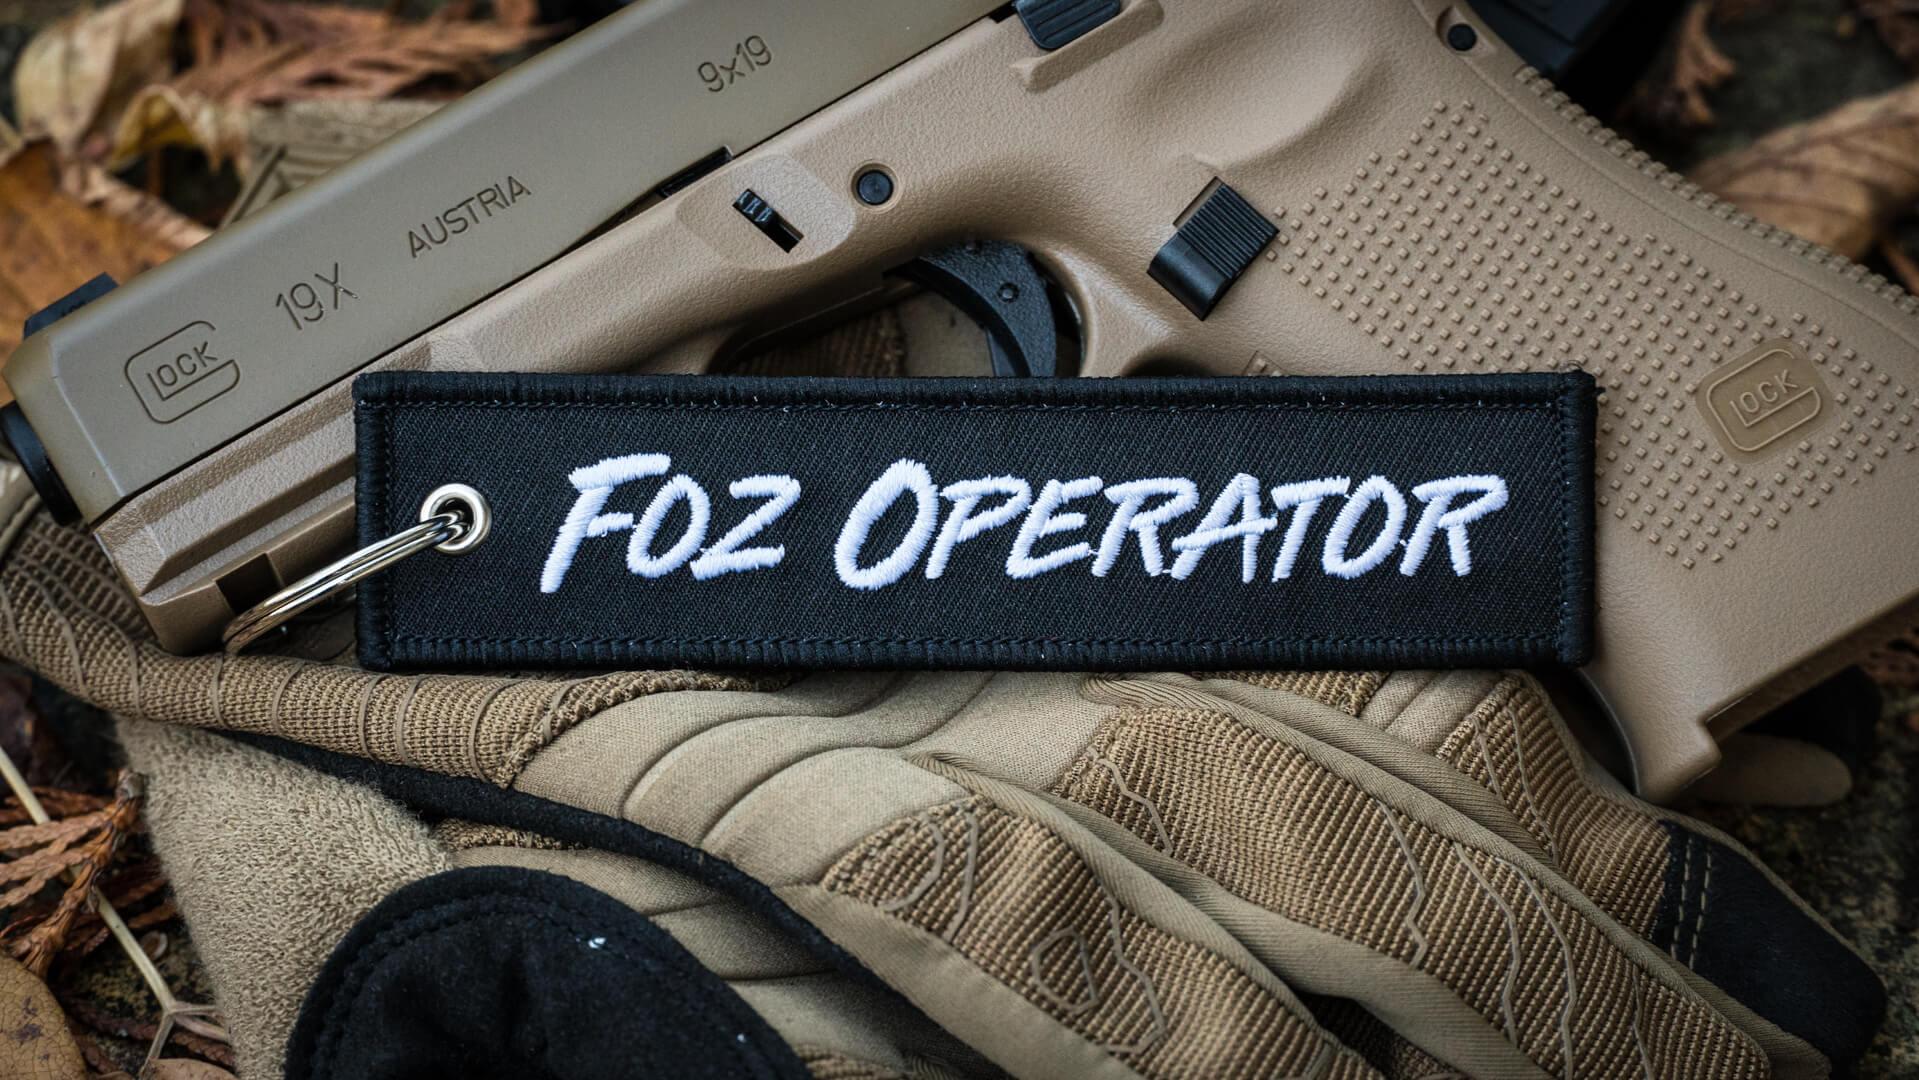 foz-operator-keychain